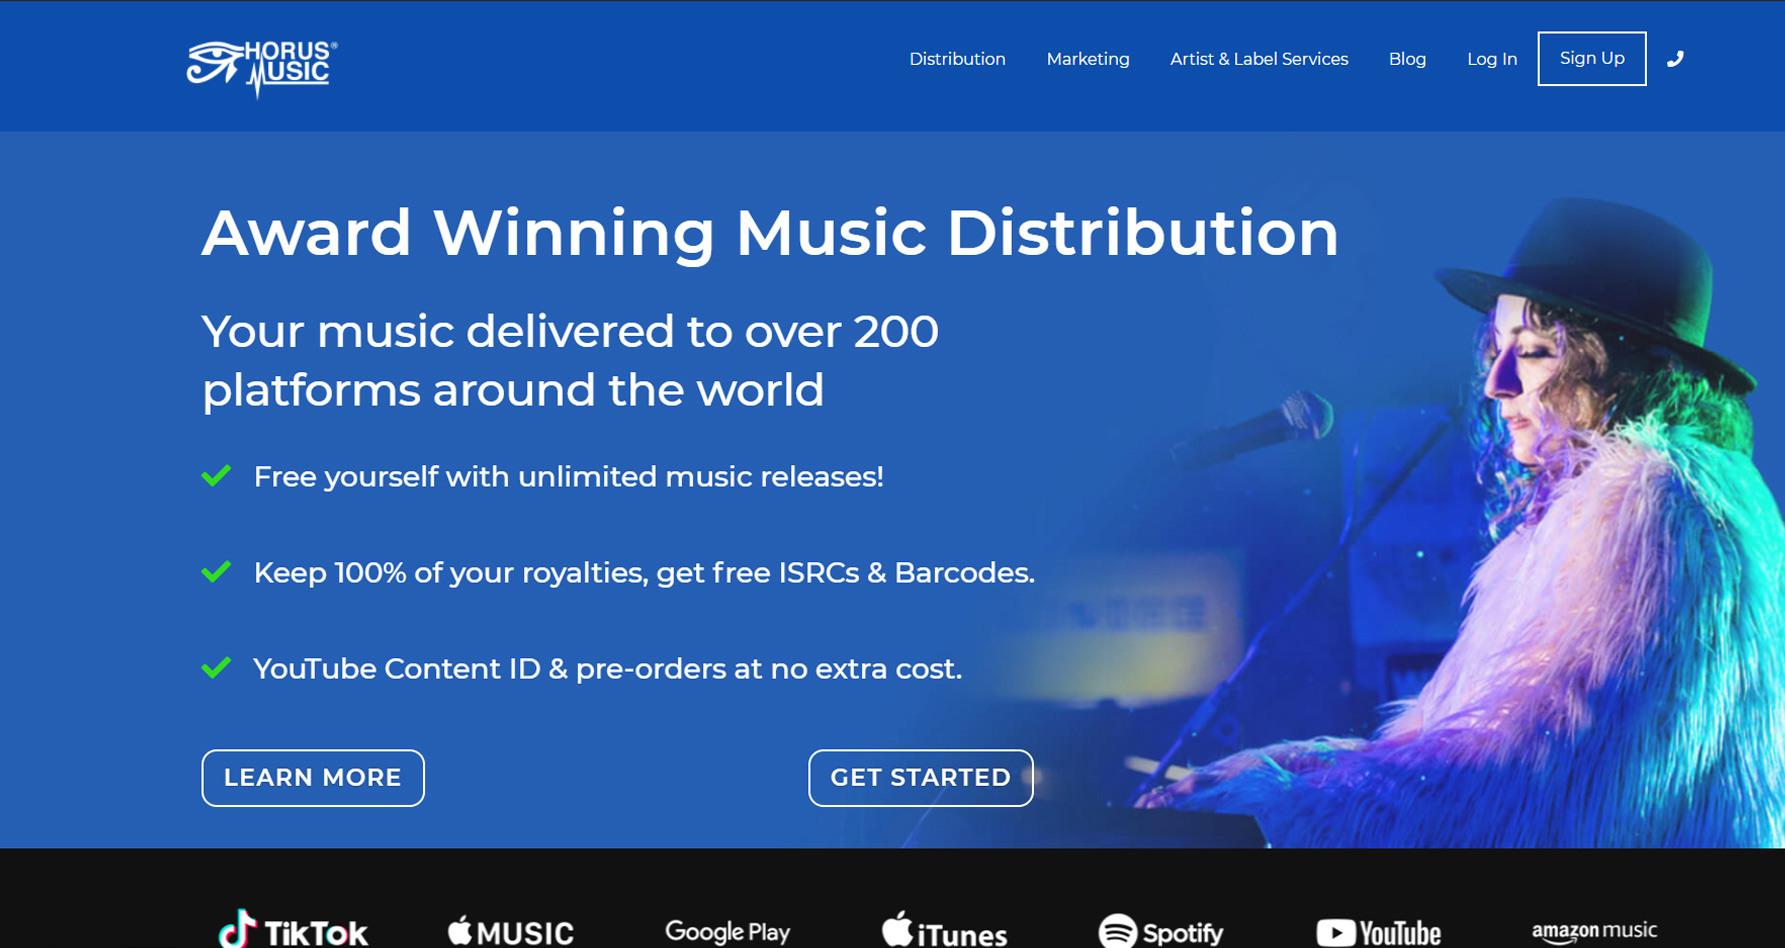 Bespoke ERP software for digital music distribution